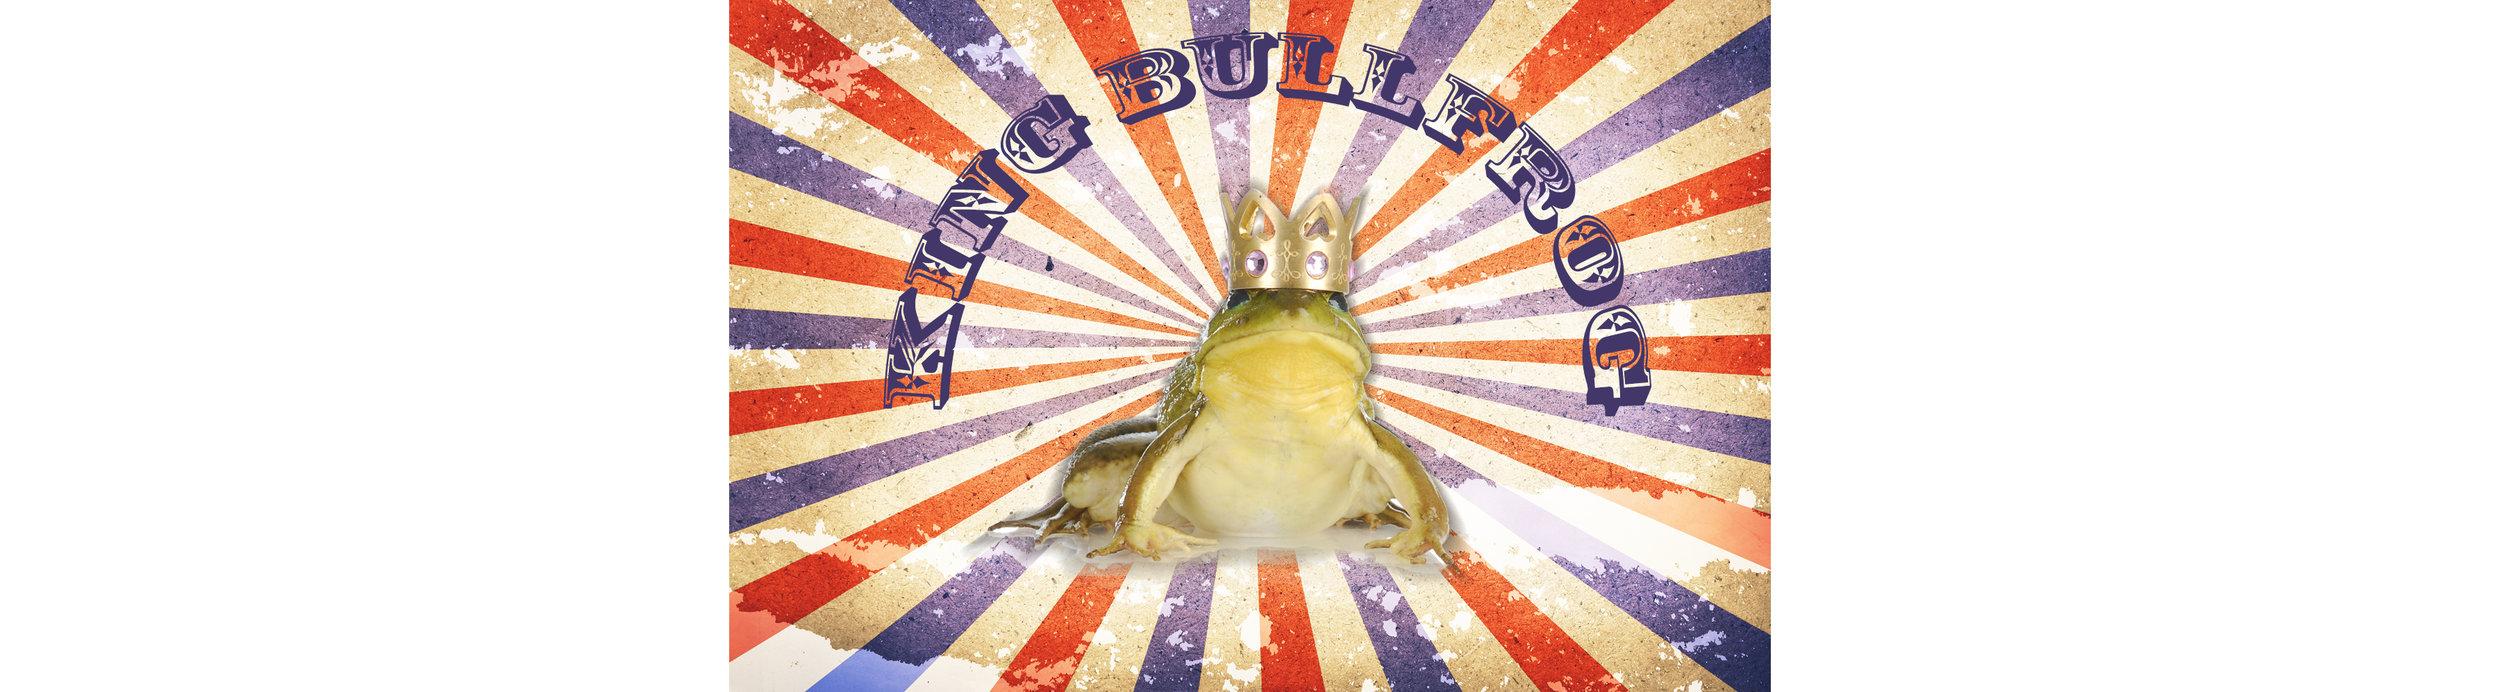 King Bullfrog About Banner.jpg